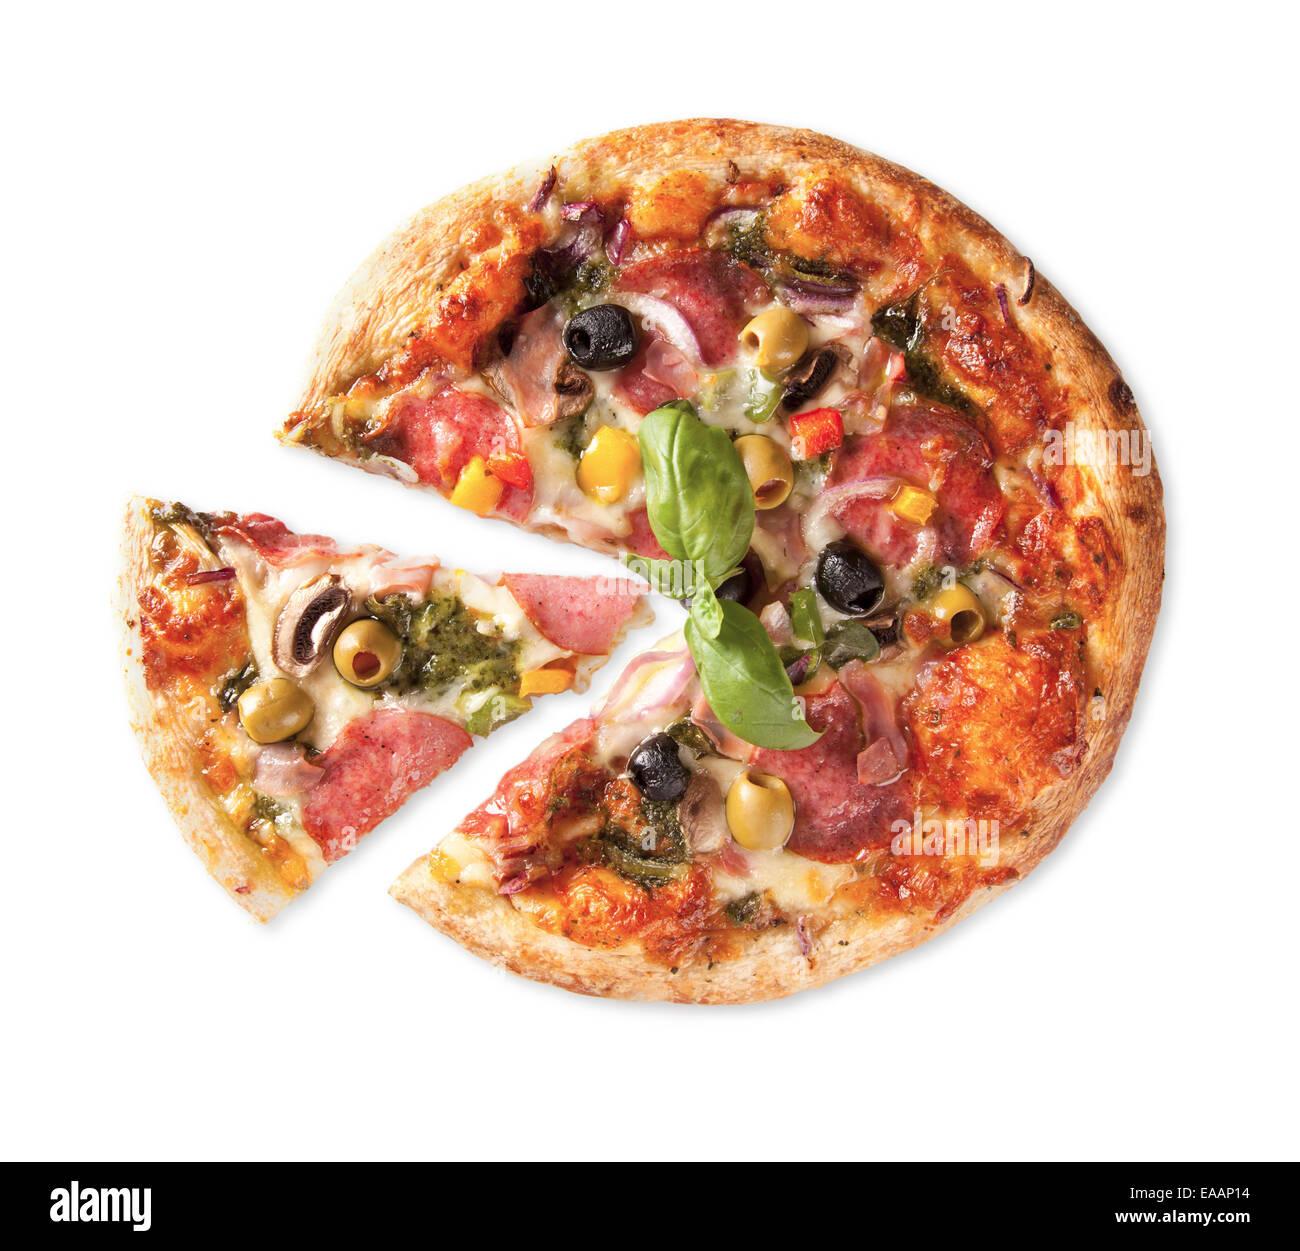 Deliciosas pizzas enteras aisladas sobre fondo blanco. Imagen De Stock